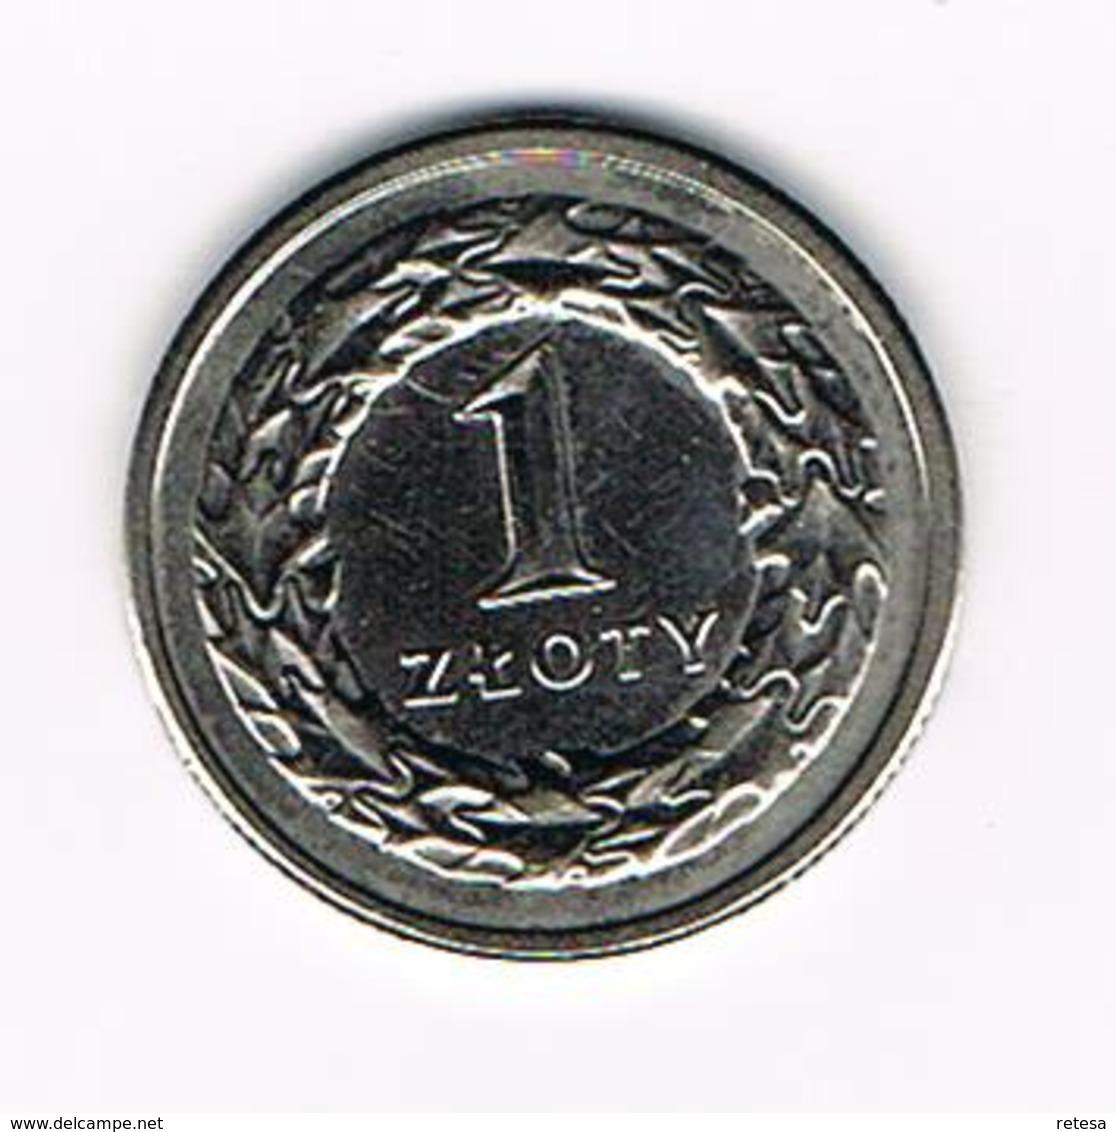 POLEN  1 ZLOTY  1991 - Polen